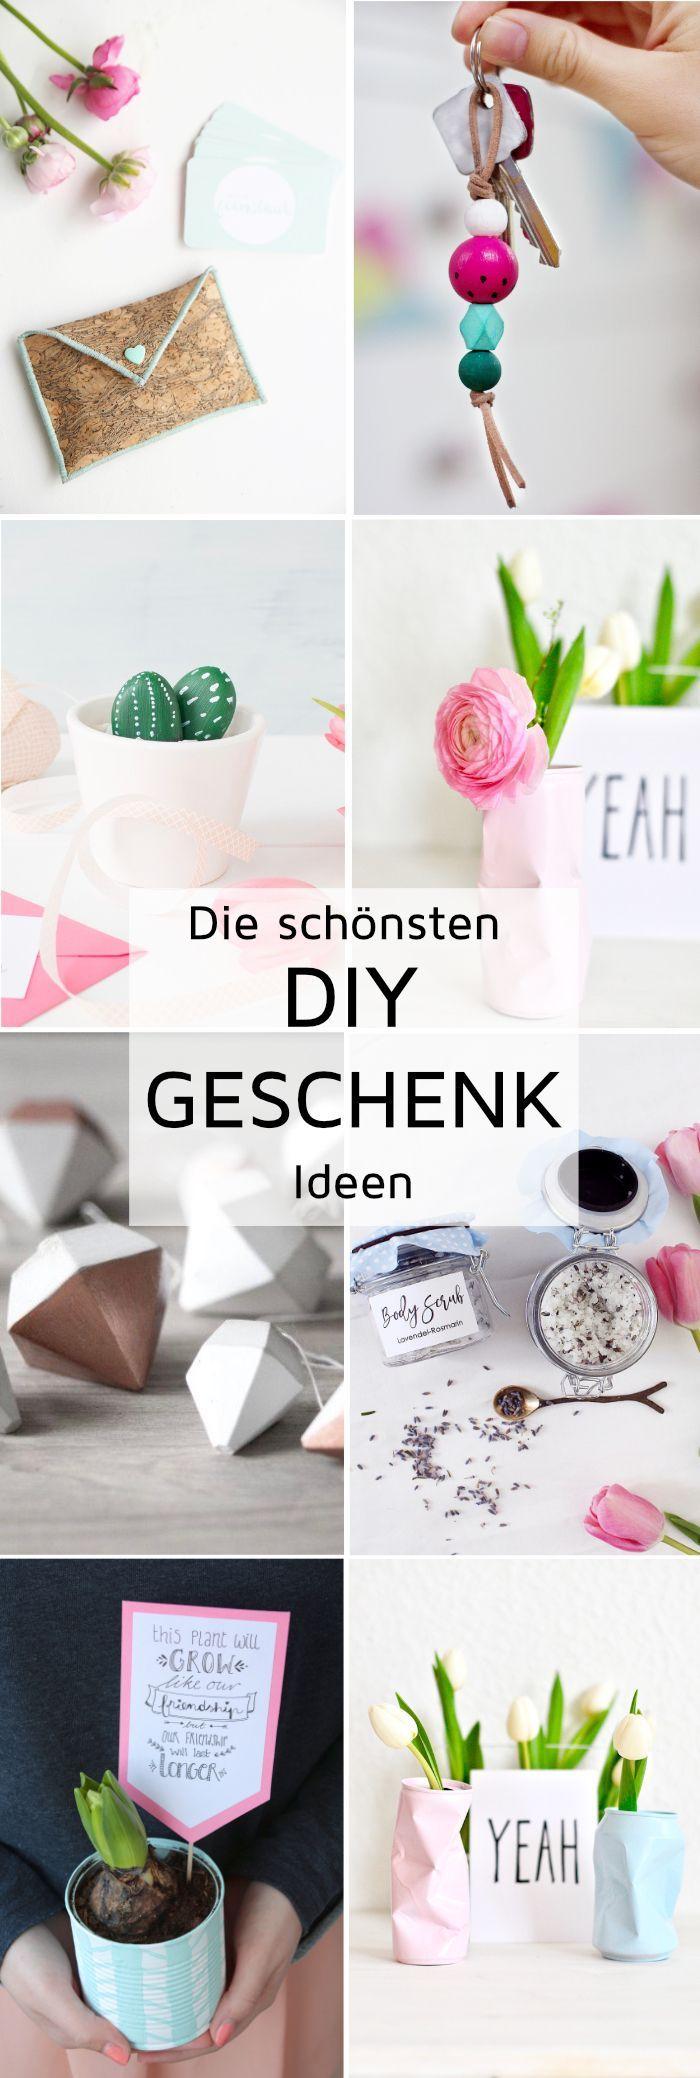 DIY Geschenke - Kreative Geschenkideen zum Selbermachen ...